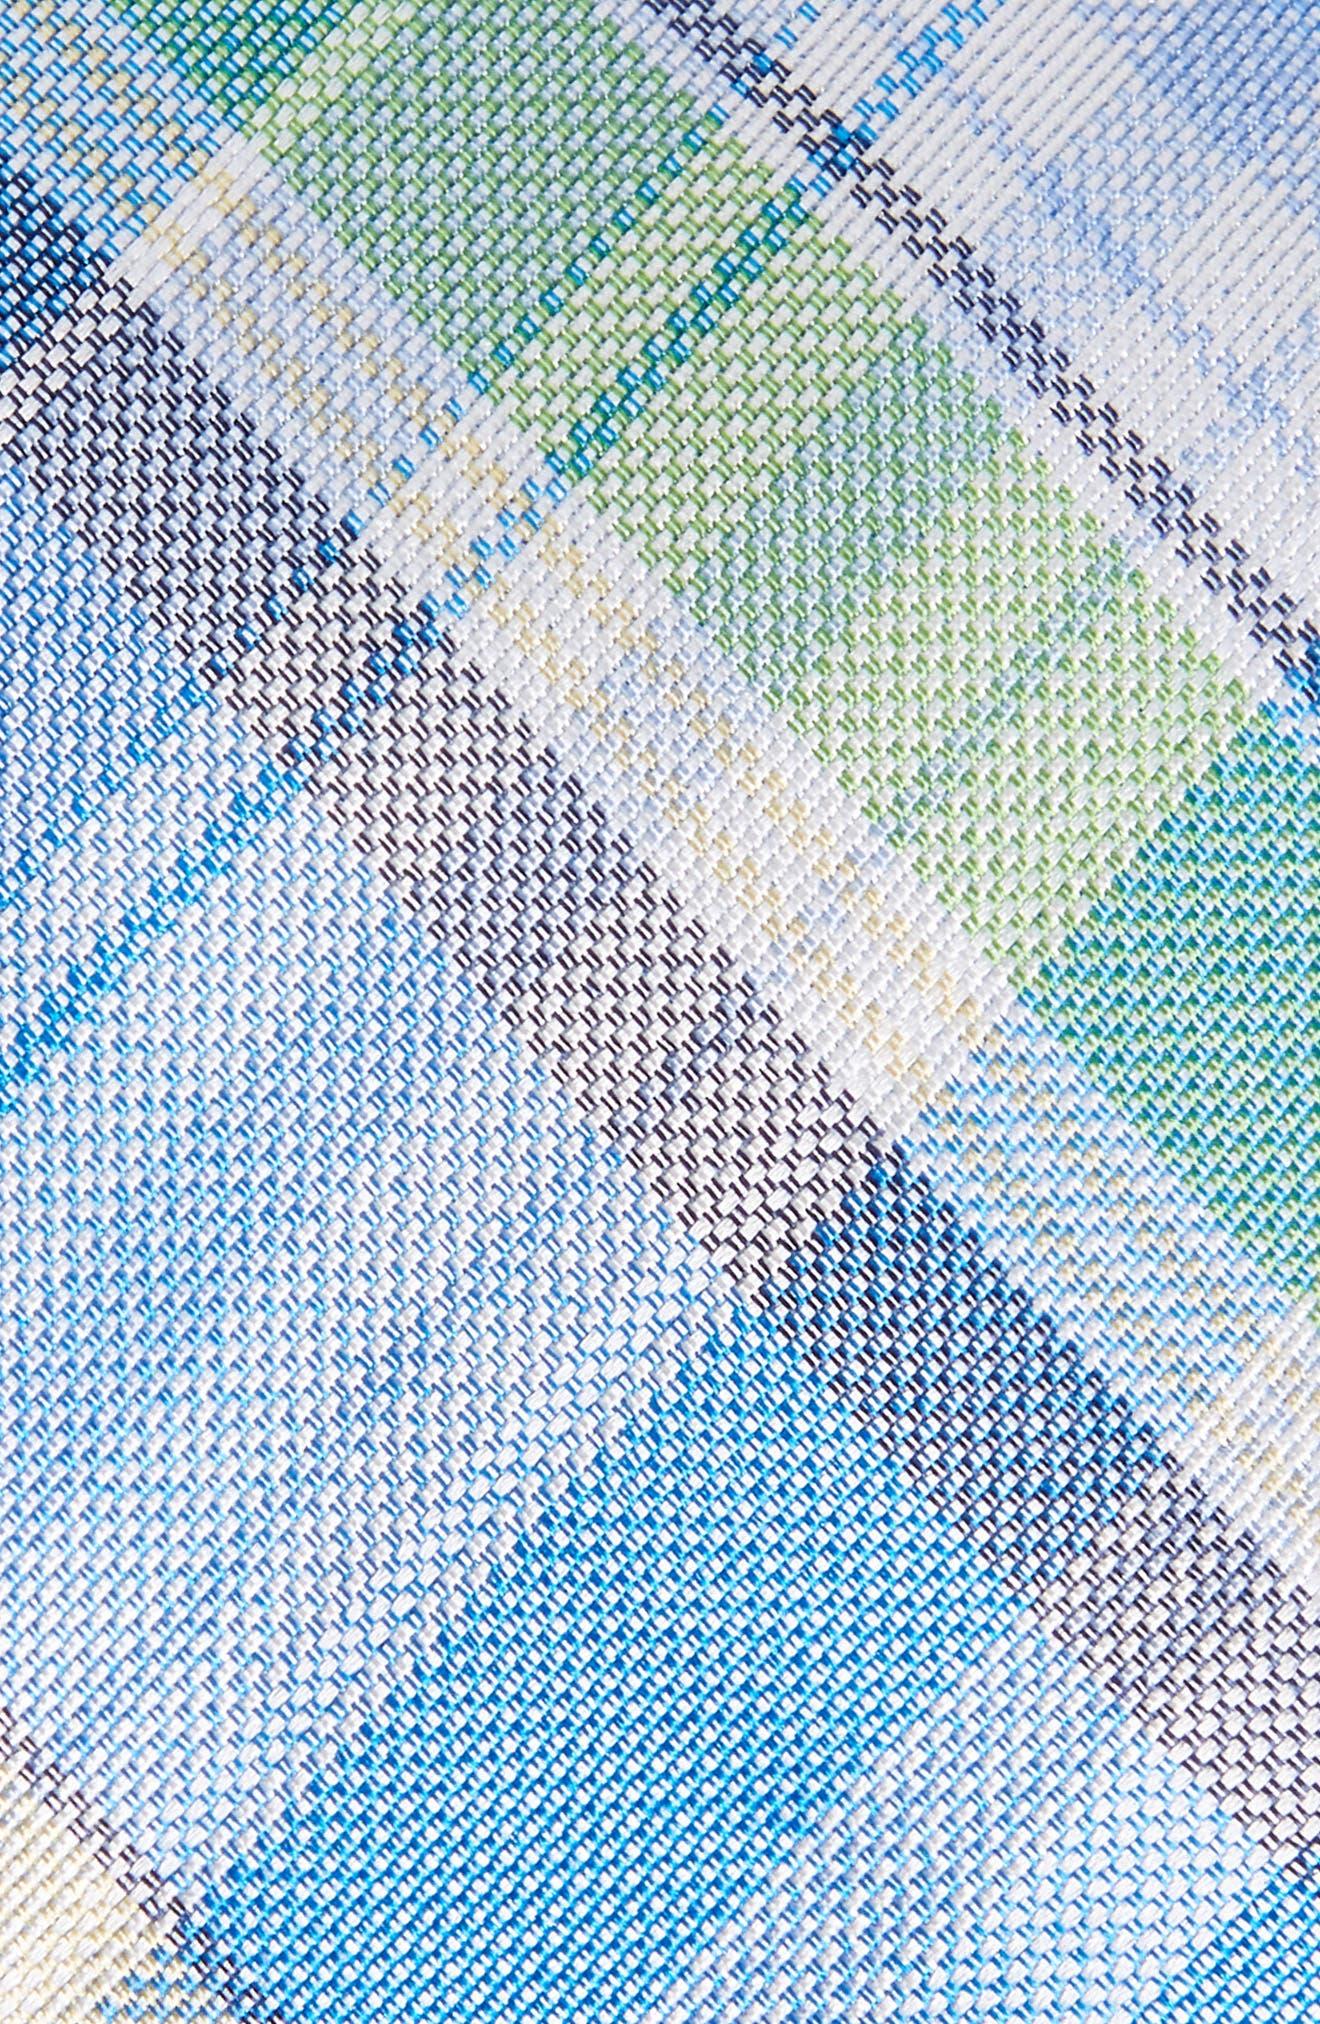 Del Rio Plaid Silk Tie,                             Alternate thumbnail 2, color,                             BLUE